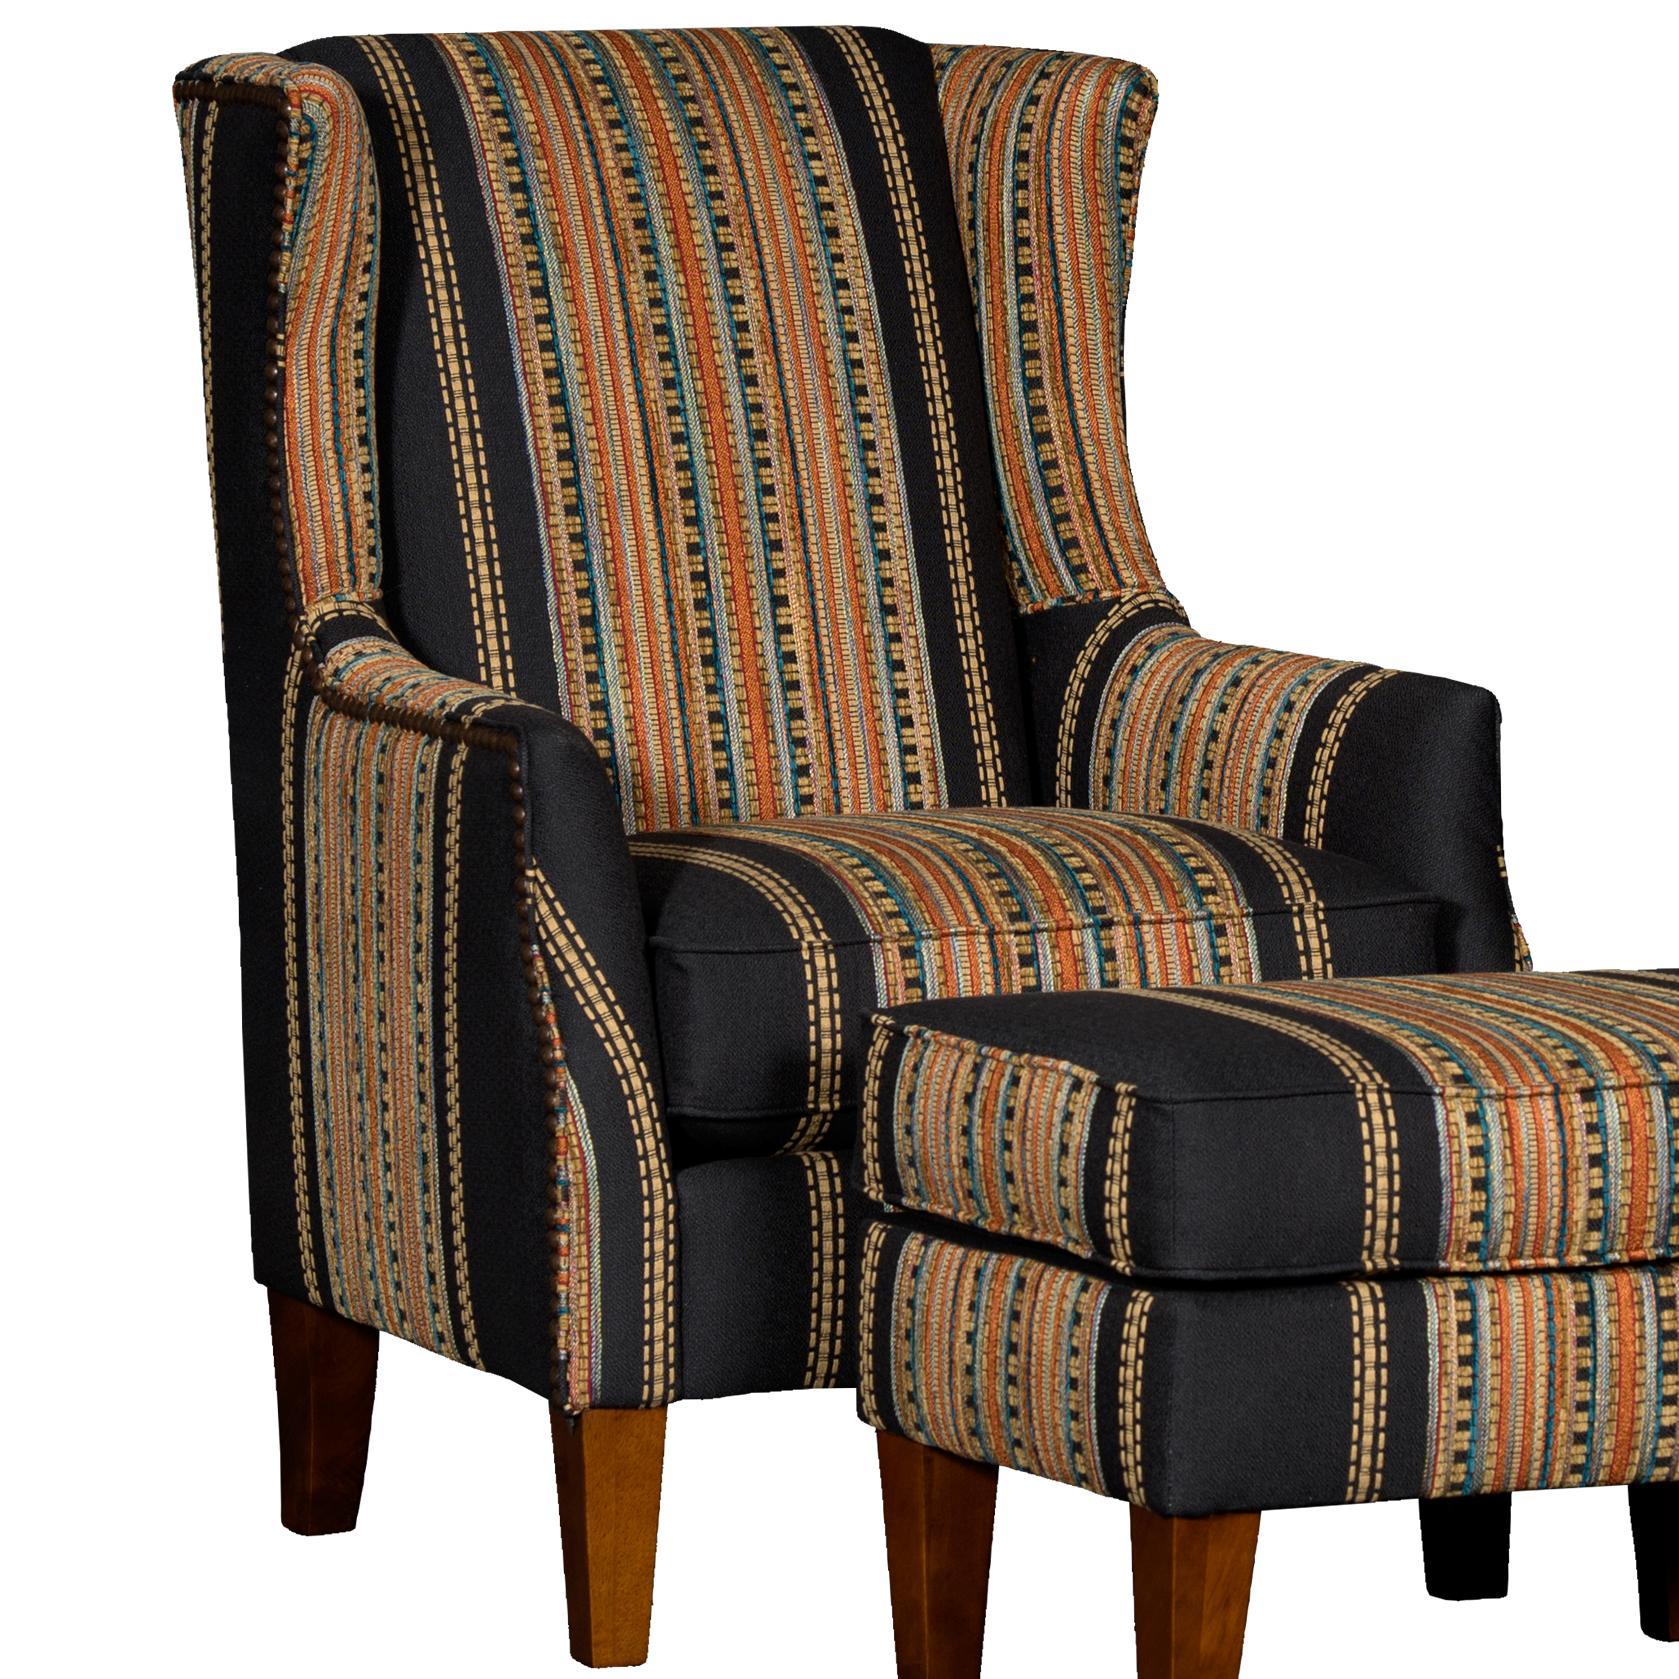 8840 Wing Chair by Mayo at Pedigo Furniture